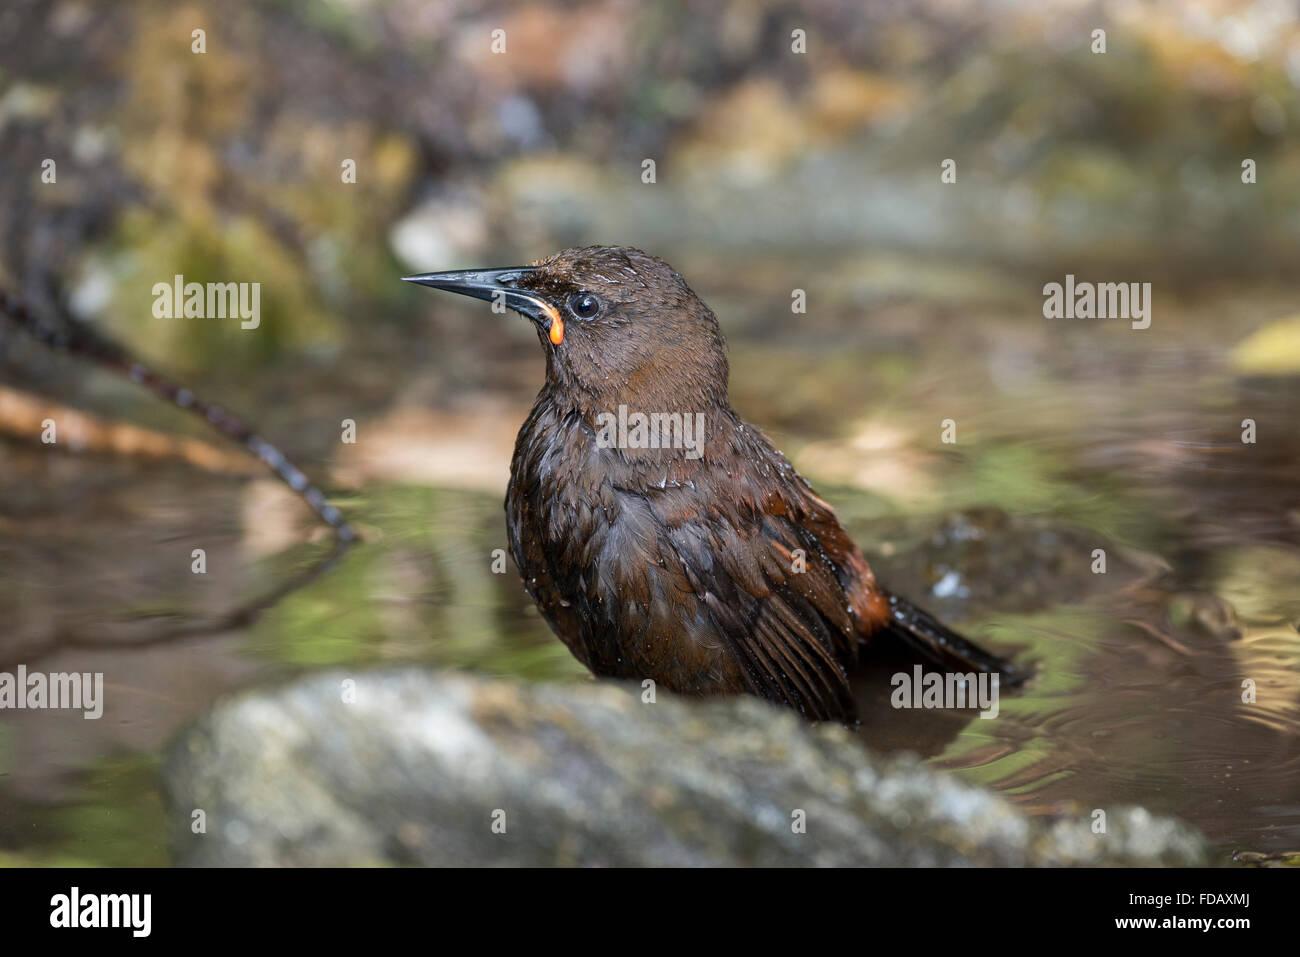 Nueva Zelandia, Marlborough Sounds, Motuara Island aka Motu Ara. Libres de predadores reserva de aves de la isla. Hembra saddleback del sur de la isla. Foto de stock